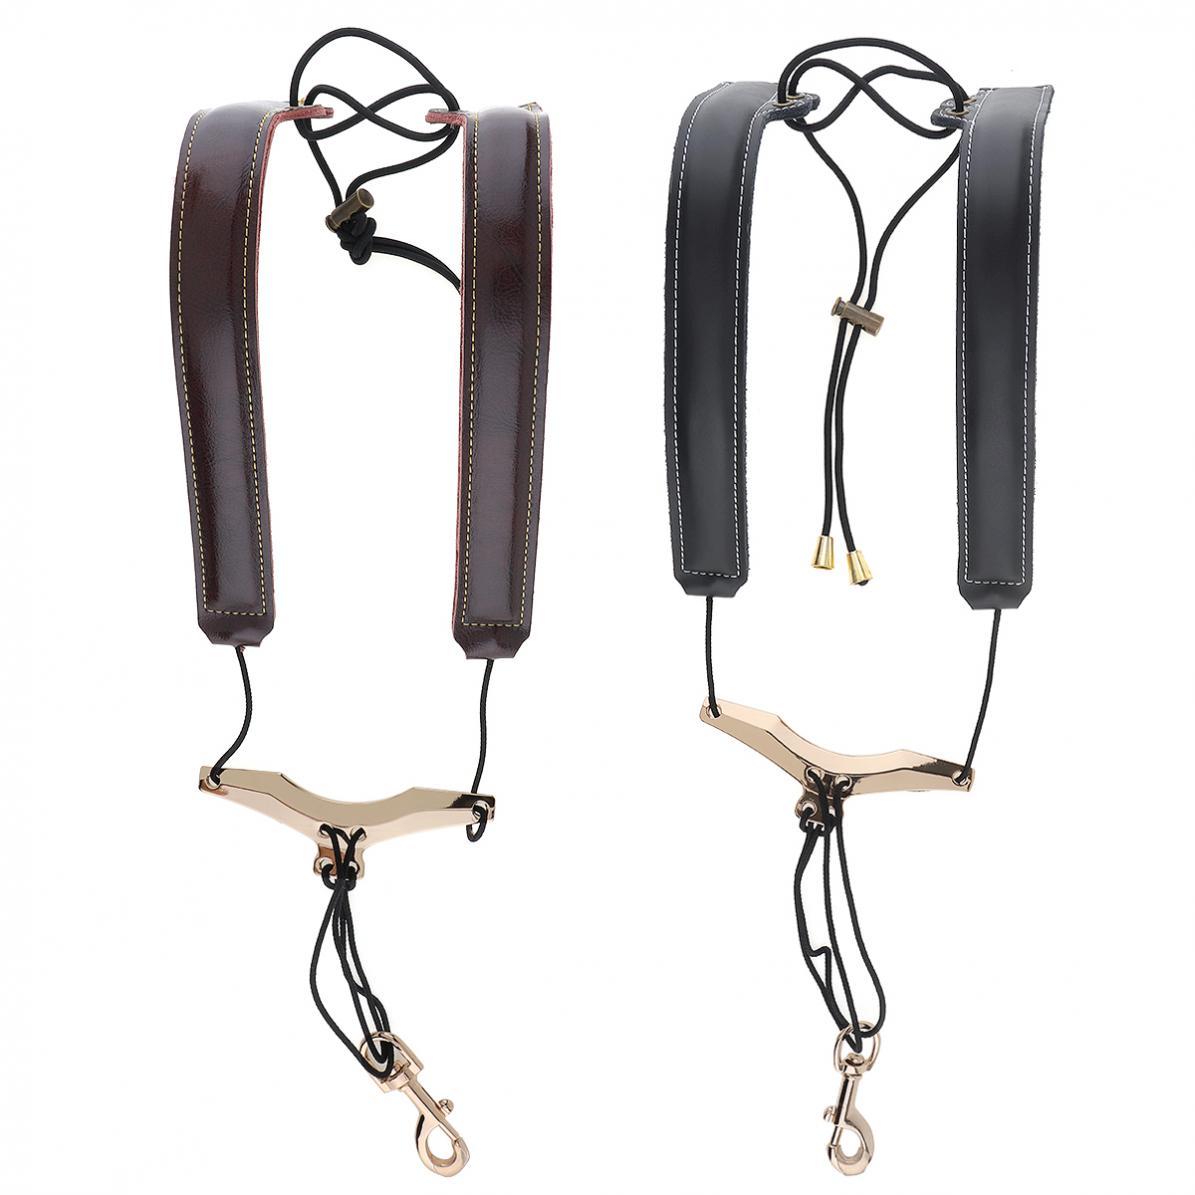 Genuine Leather Saxophone Double Shoulder Neck Strap Cowhide Material Adjustable Sax Stage Play  Neck Belt  2 Colors Optional